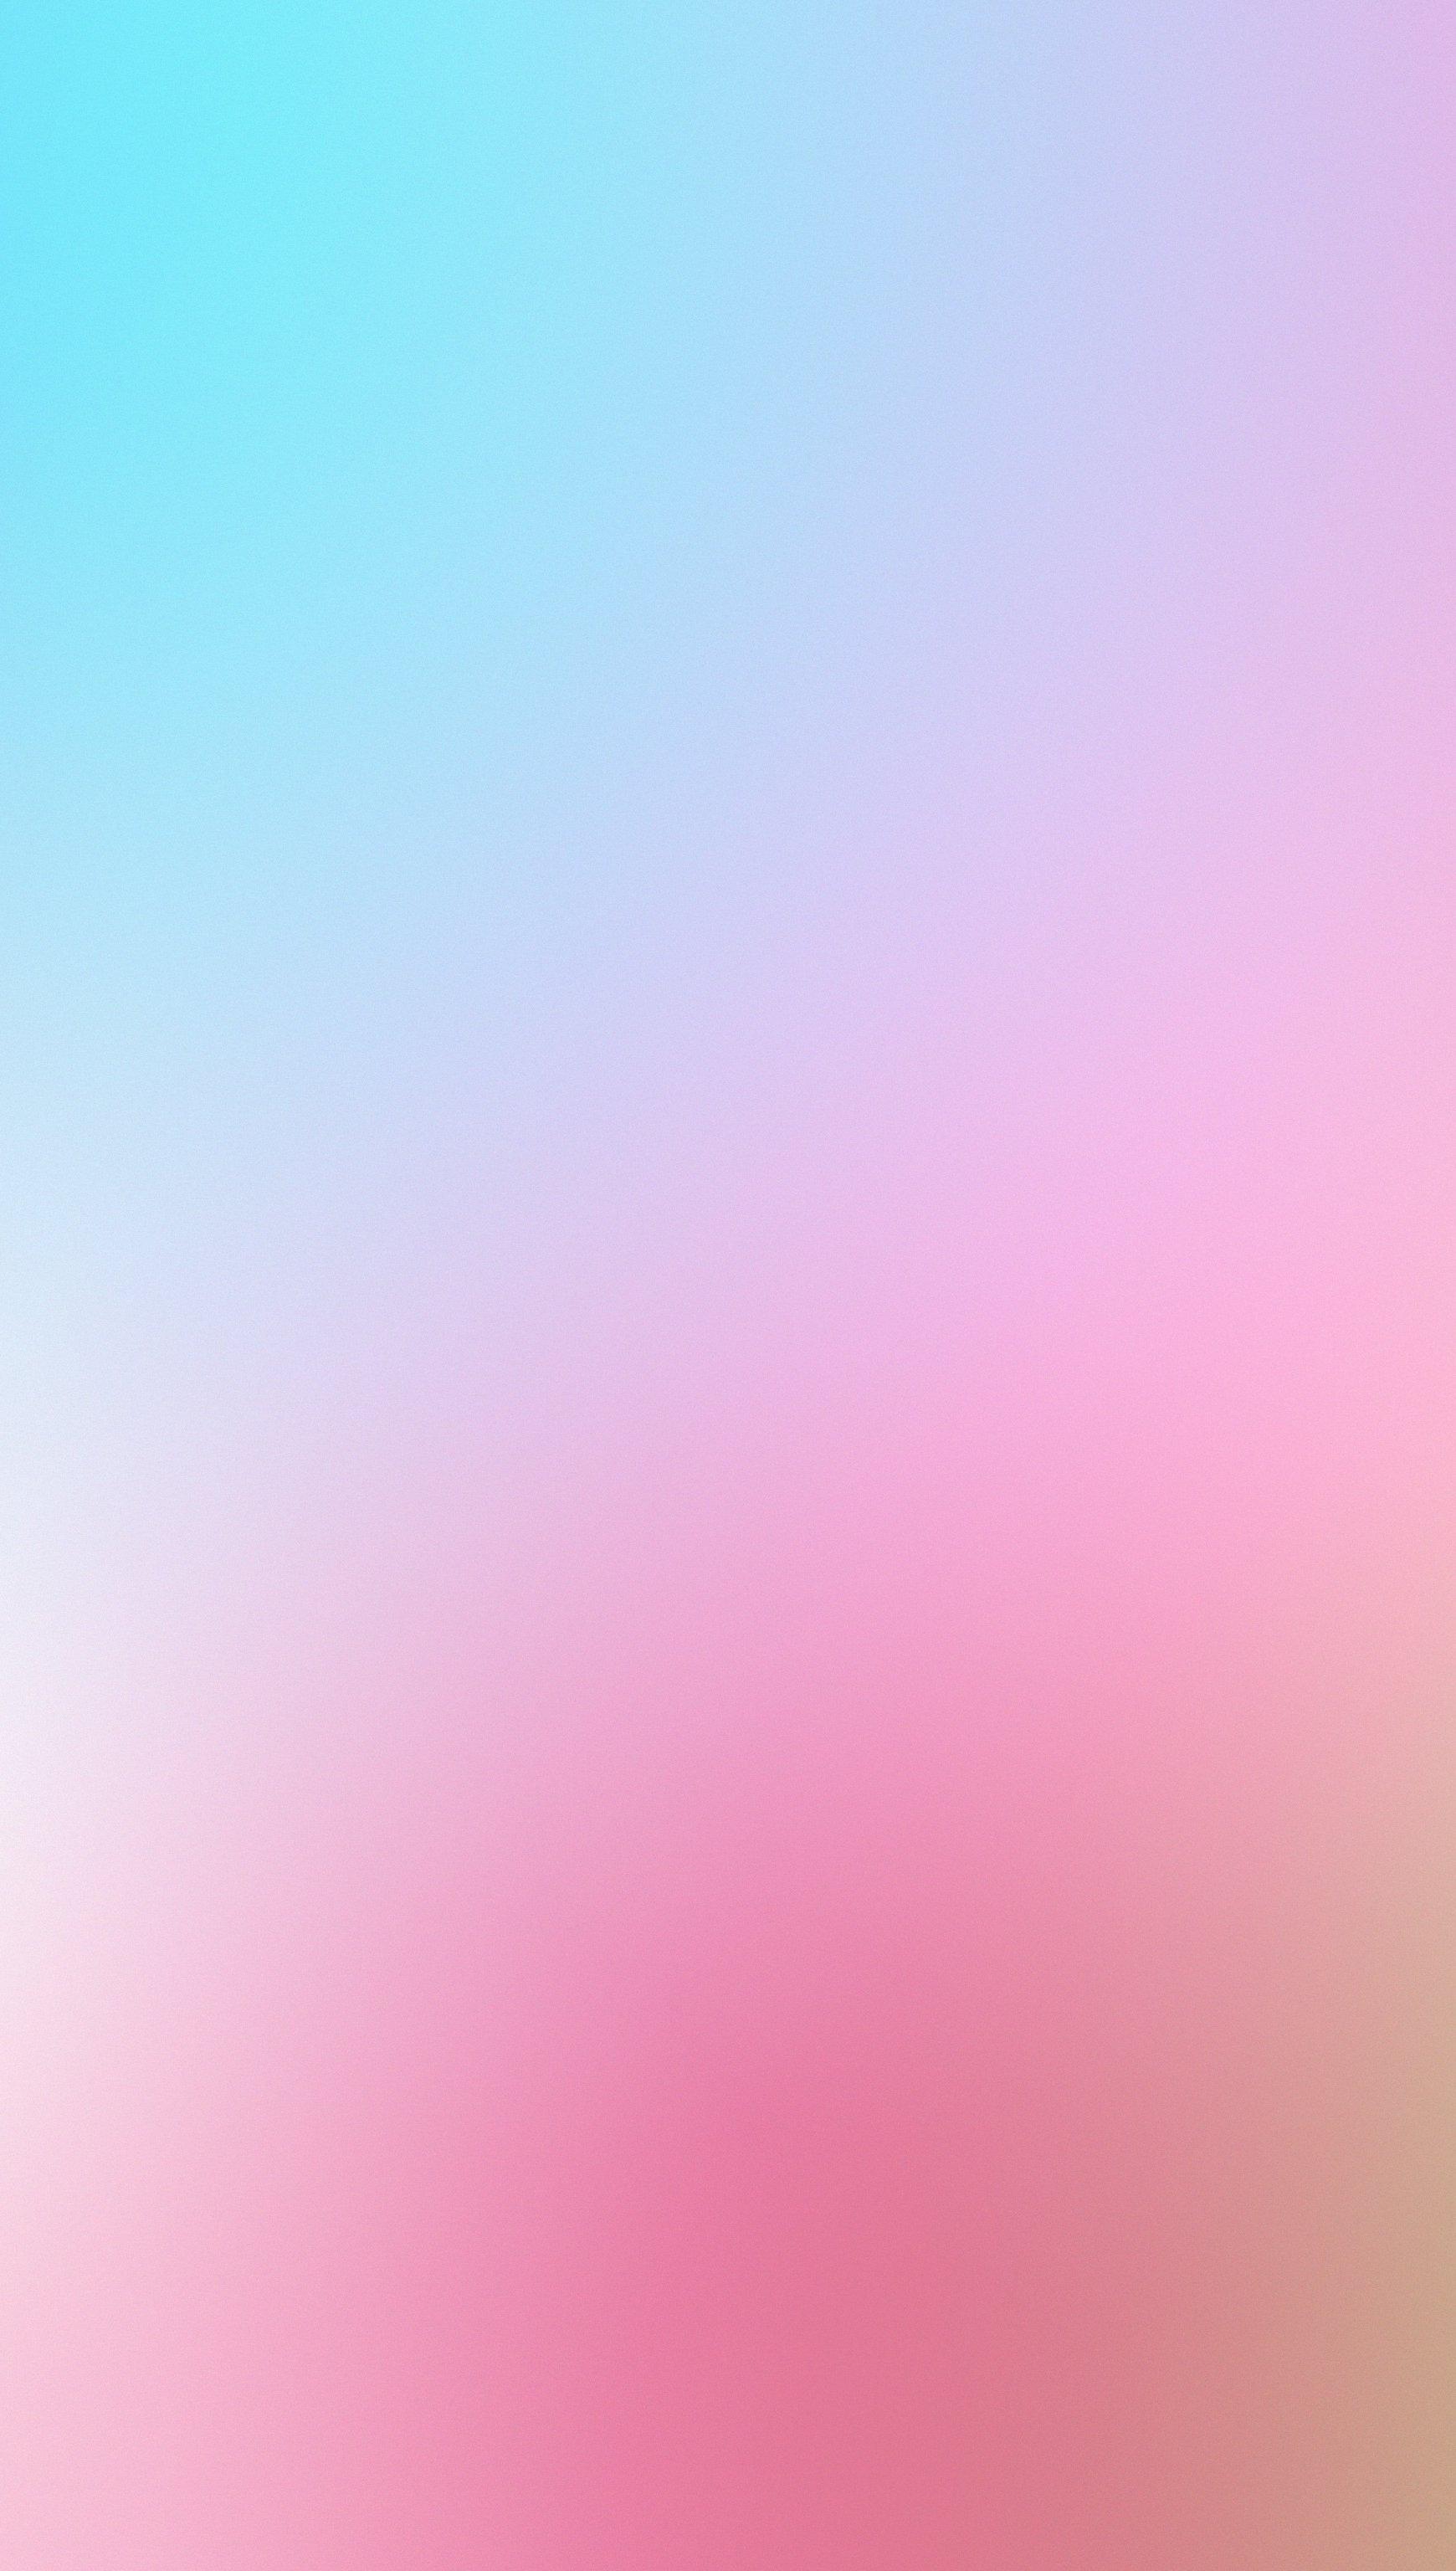 Wallpaper Blurry colors Vertical